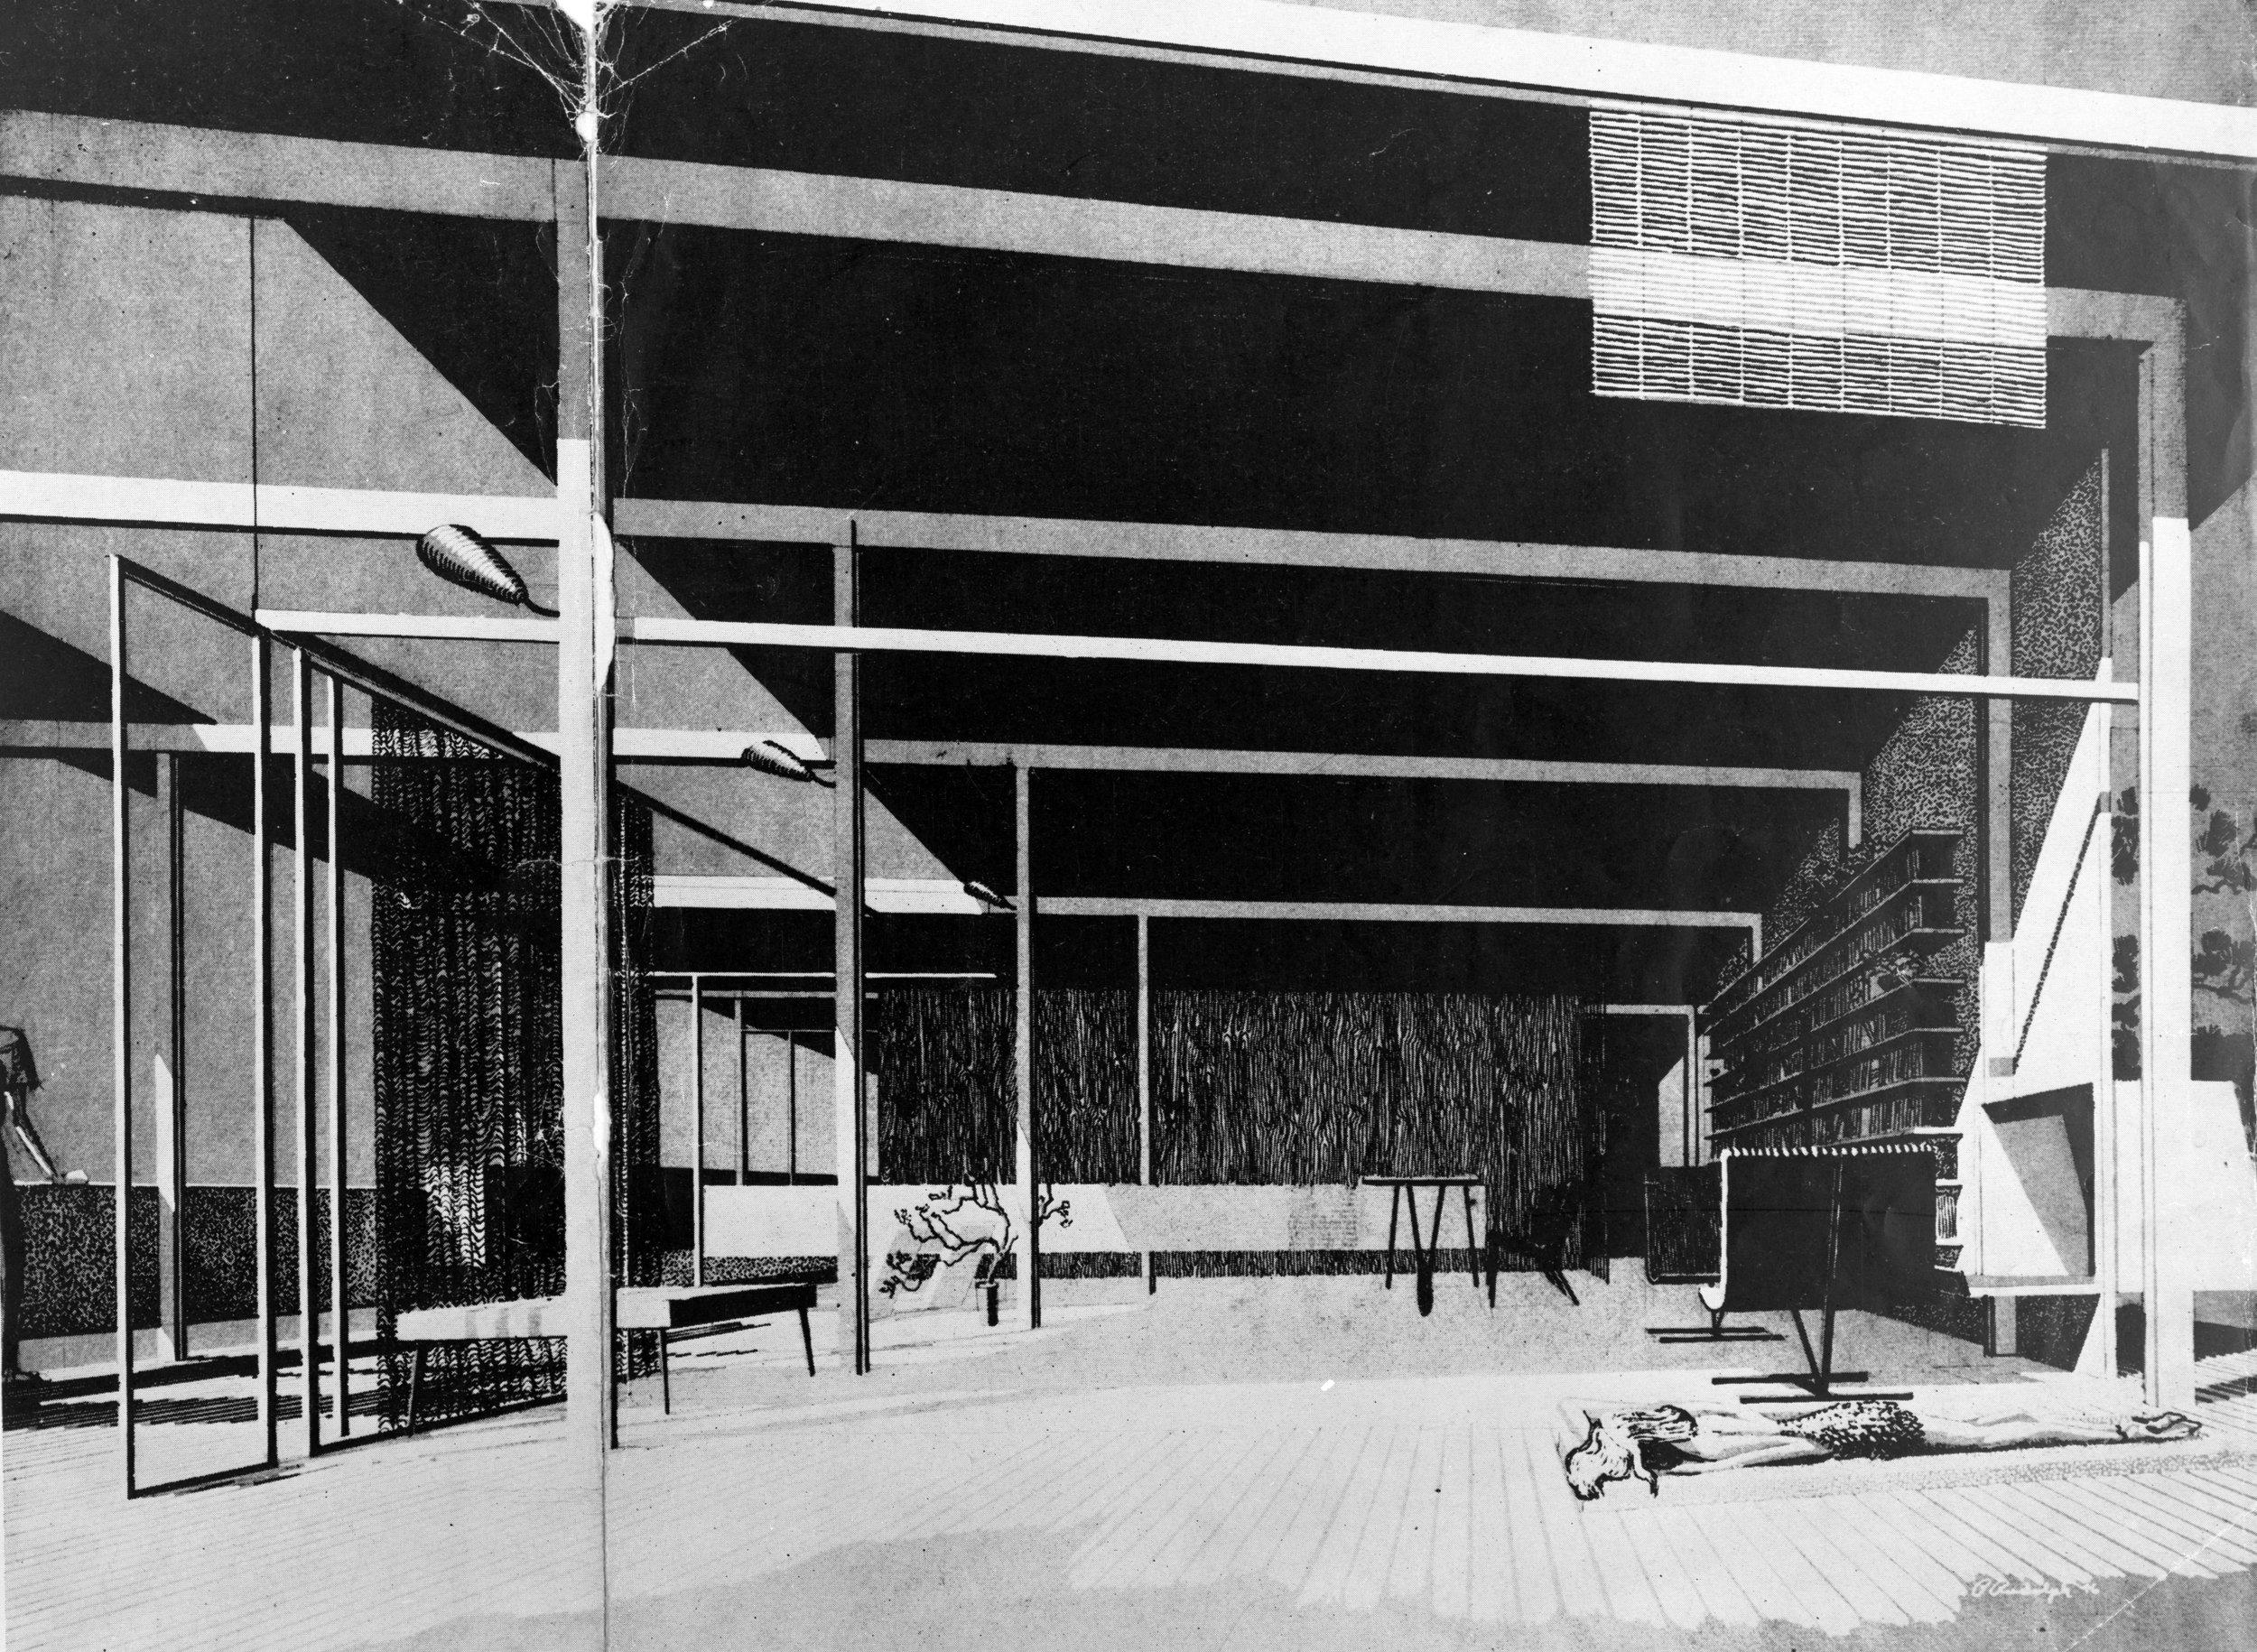 Miller Boat House, 1946